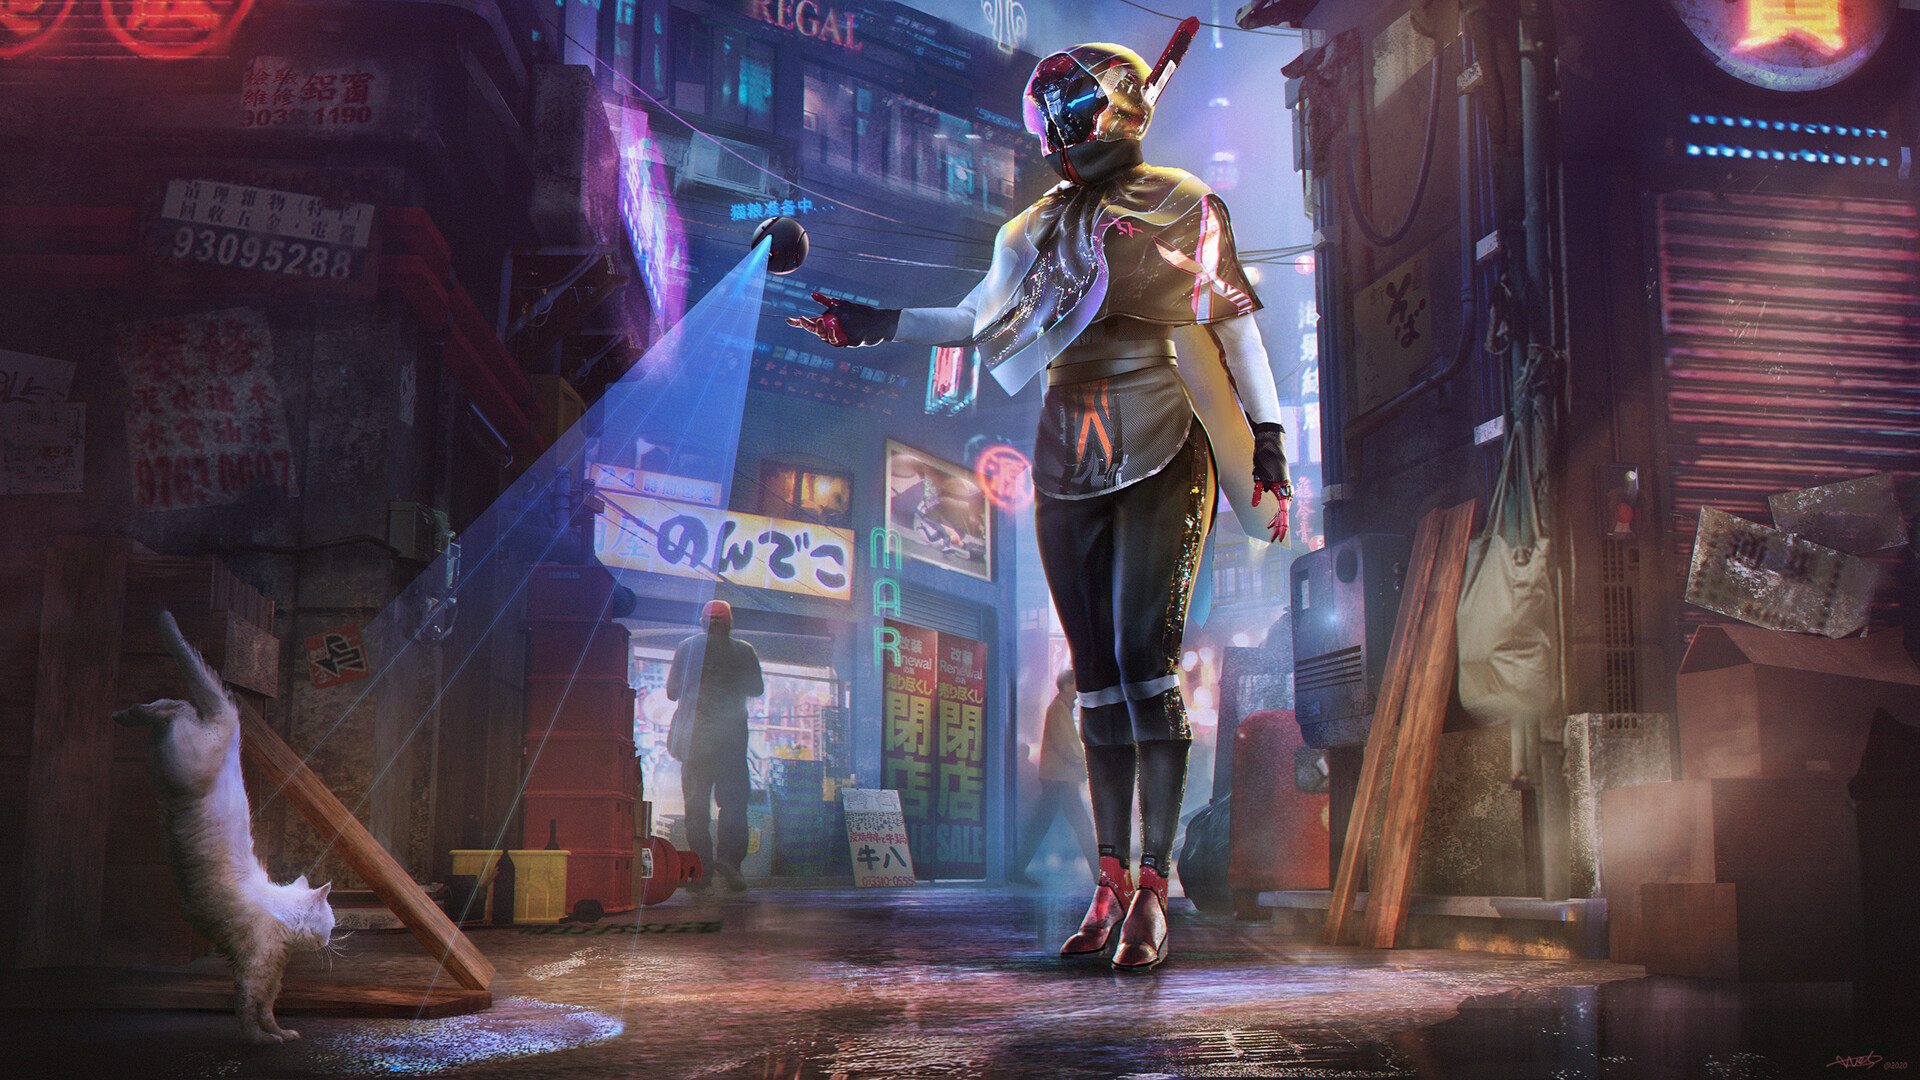 1920x1080 Droid Girl New Cyberpunk Art 1080P Laptop Full ...